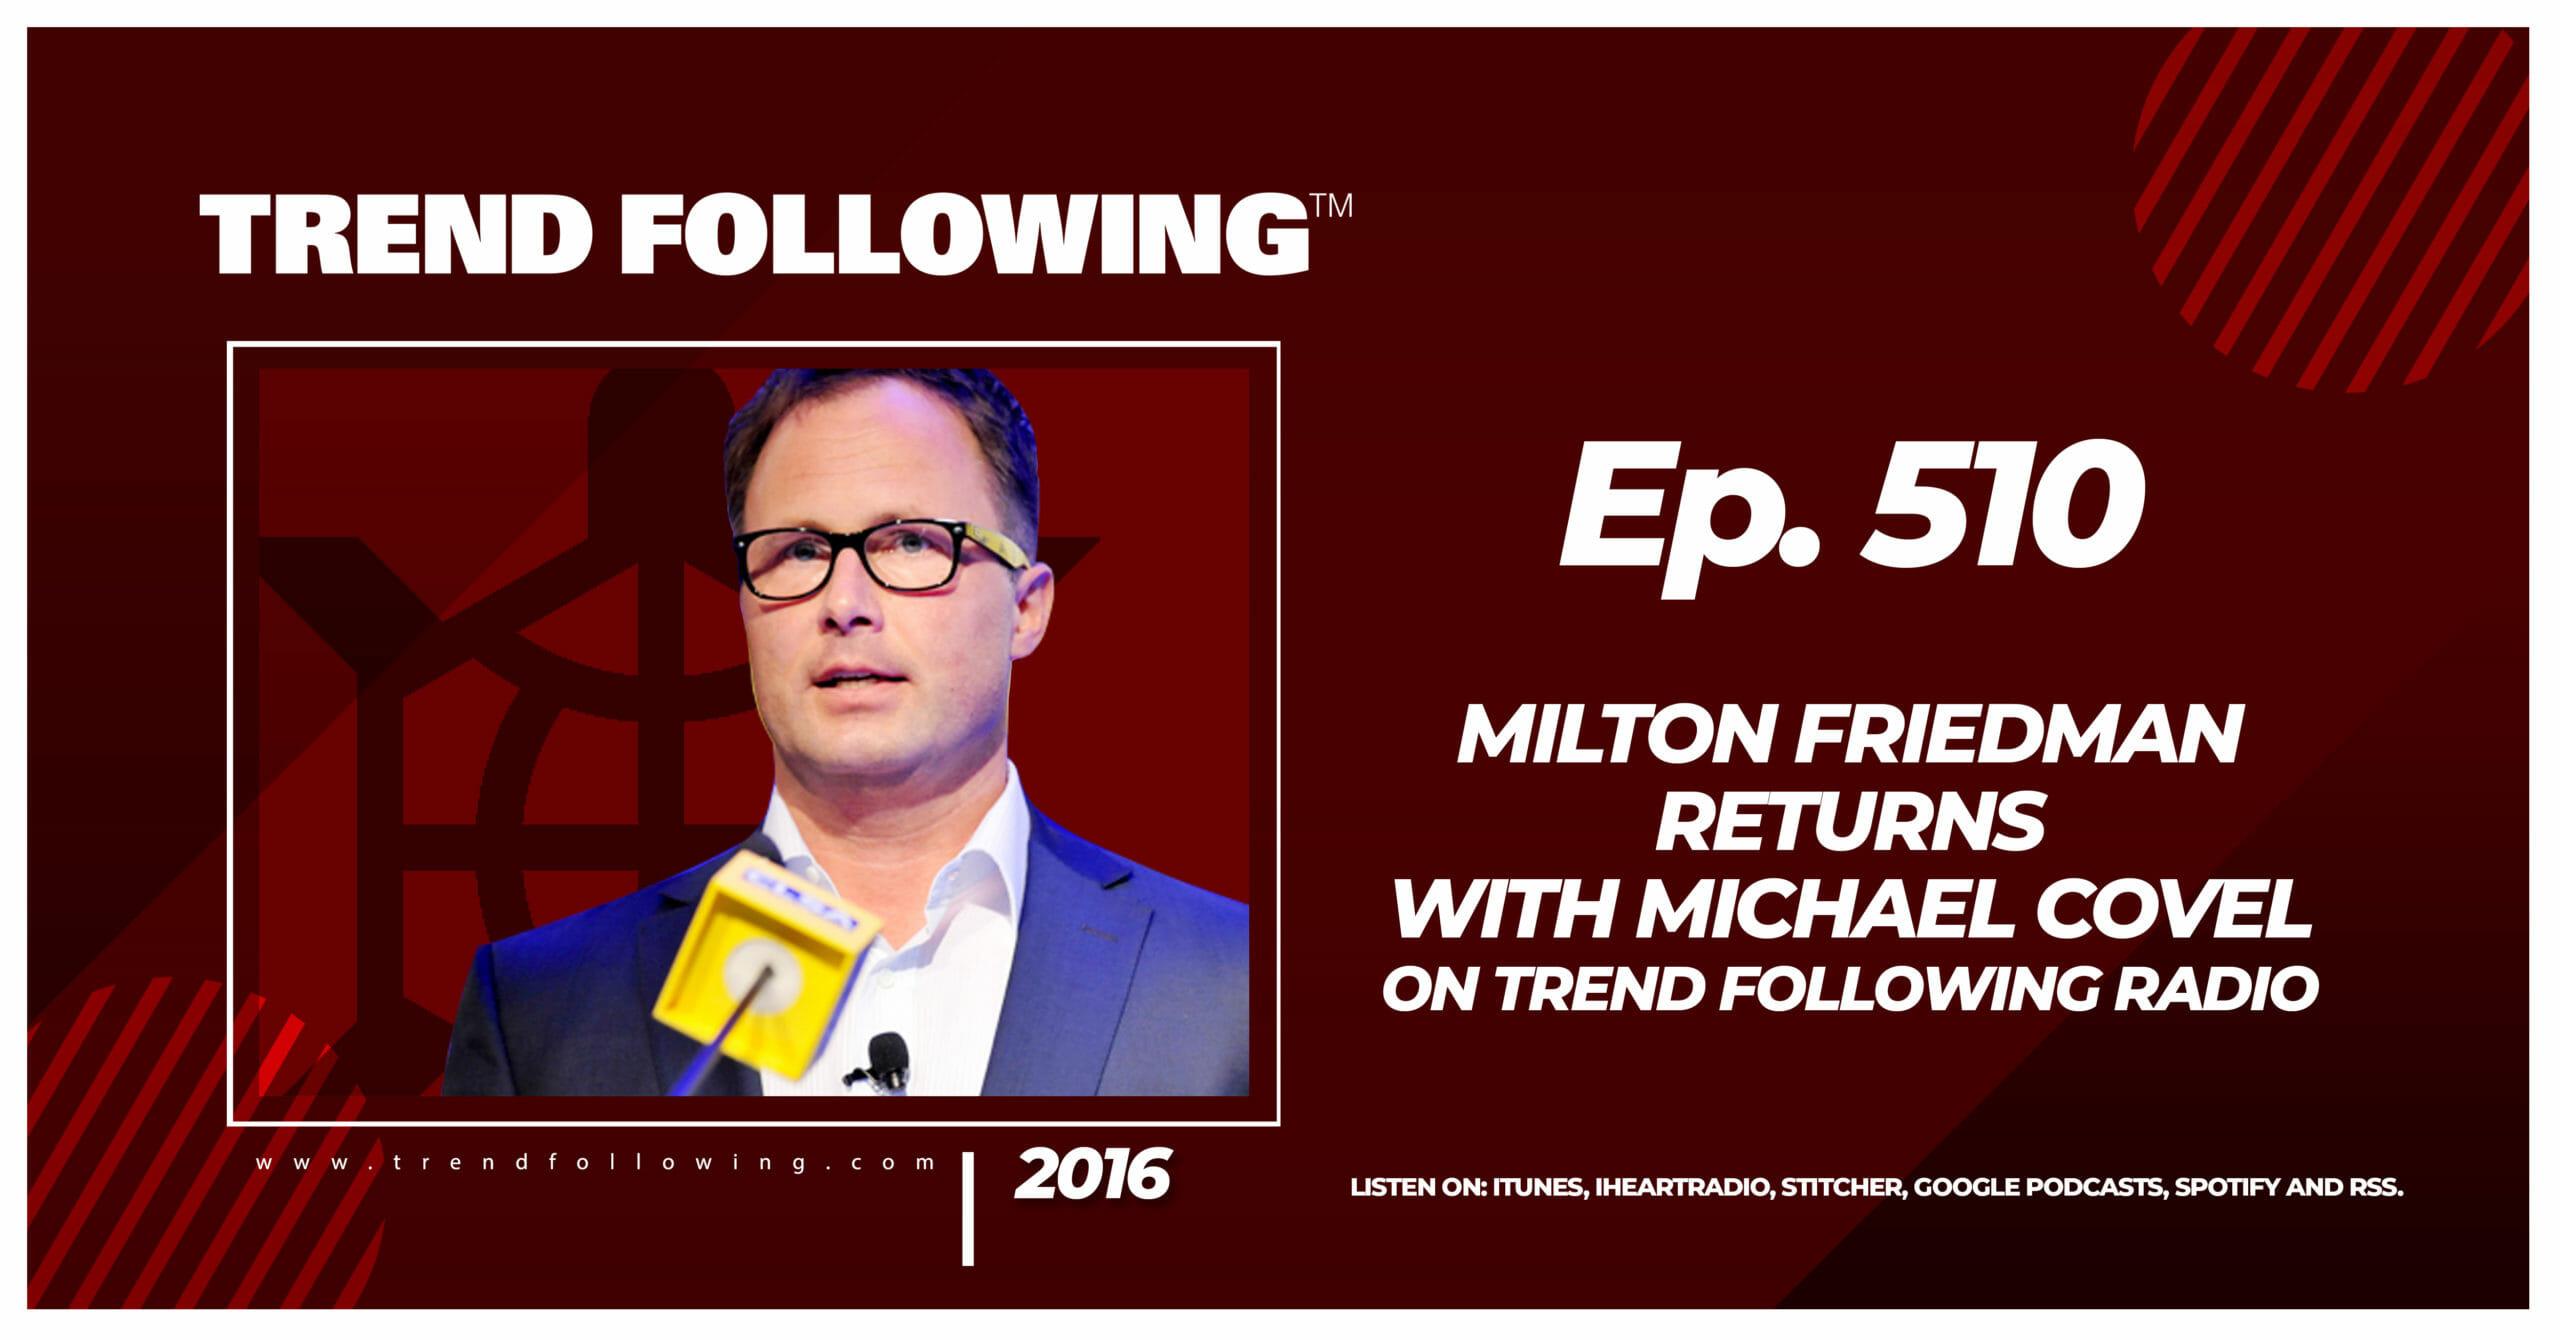 Milton Friedman Returns with Michael Covel on Trend Following Radio